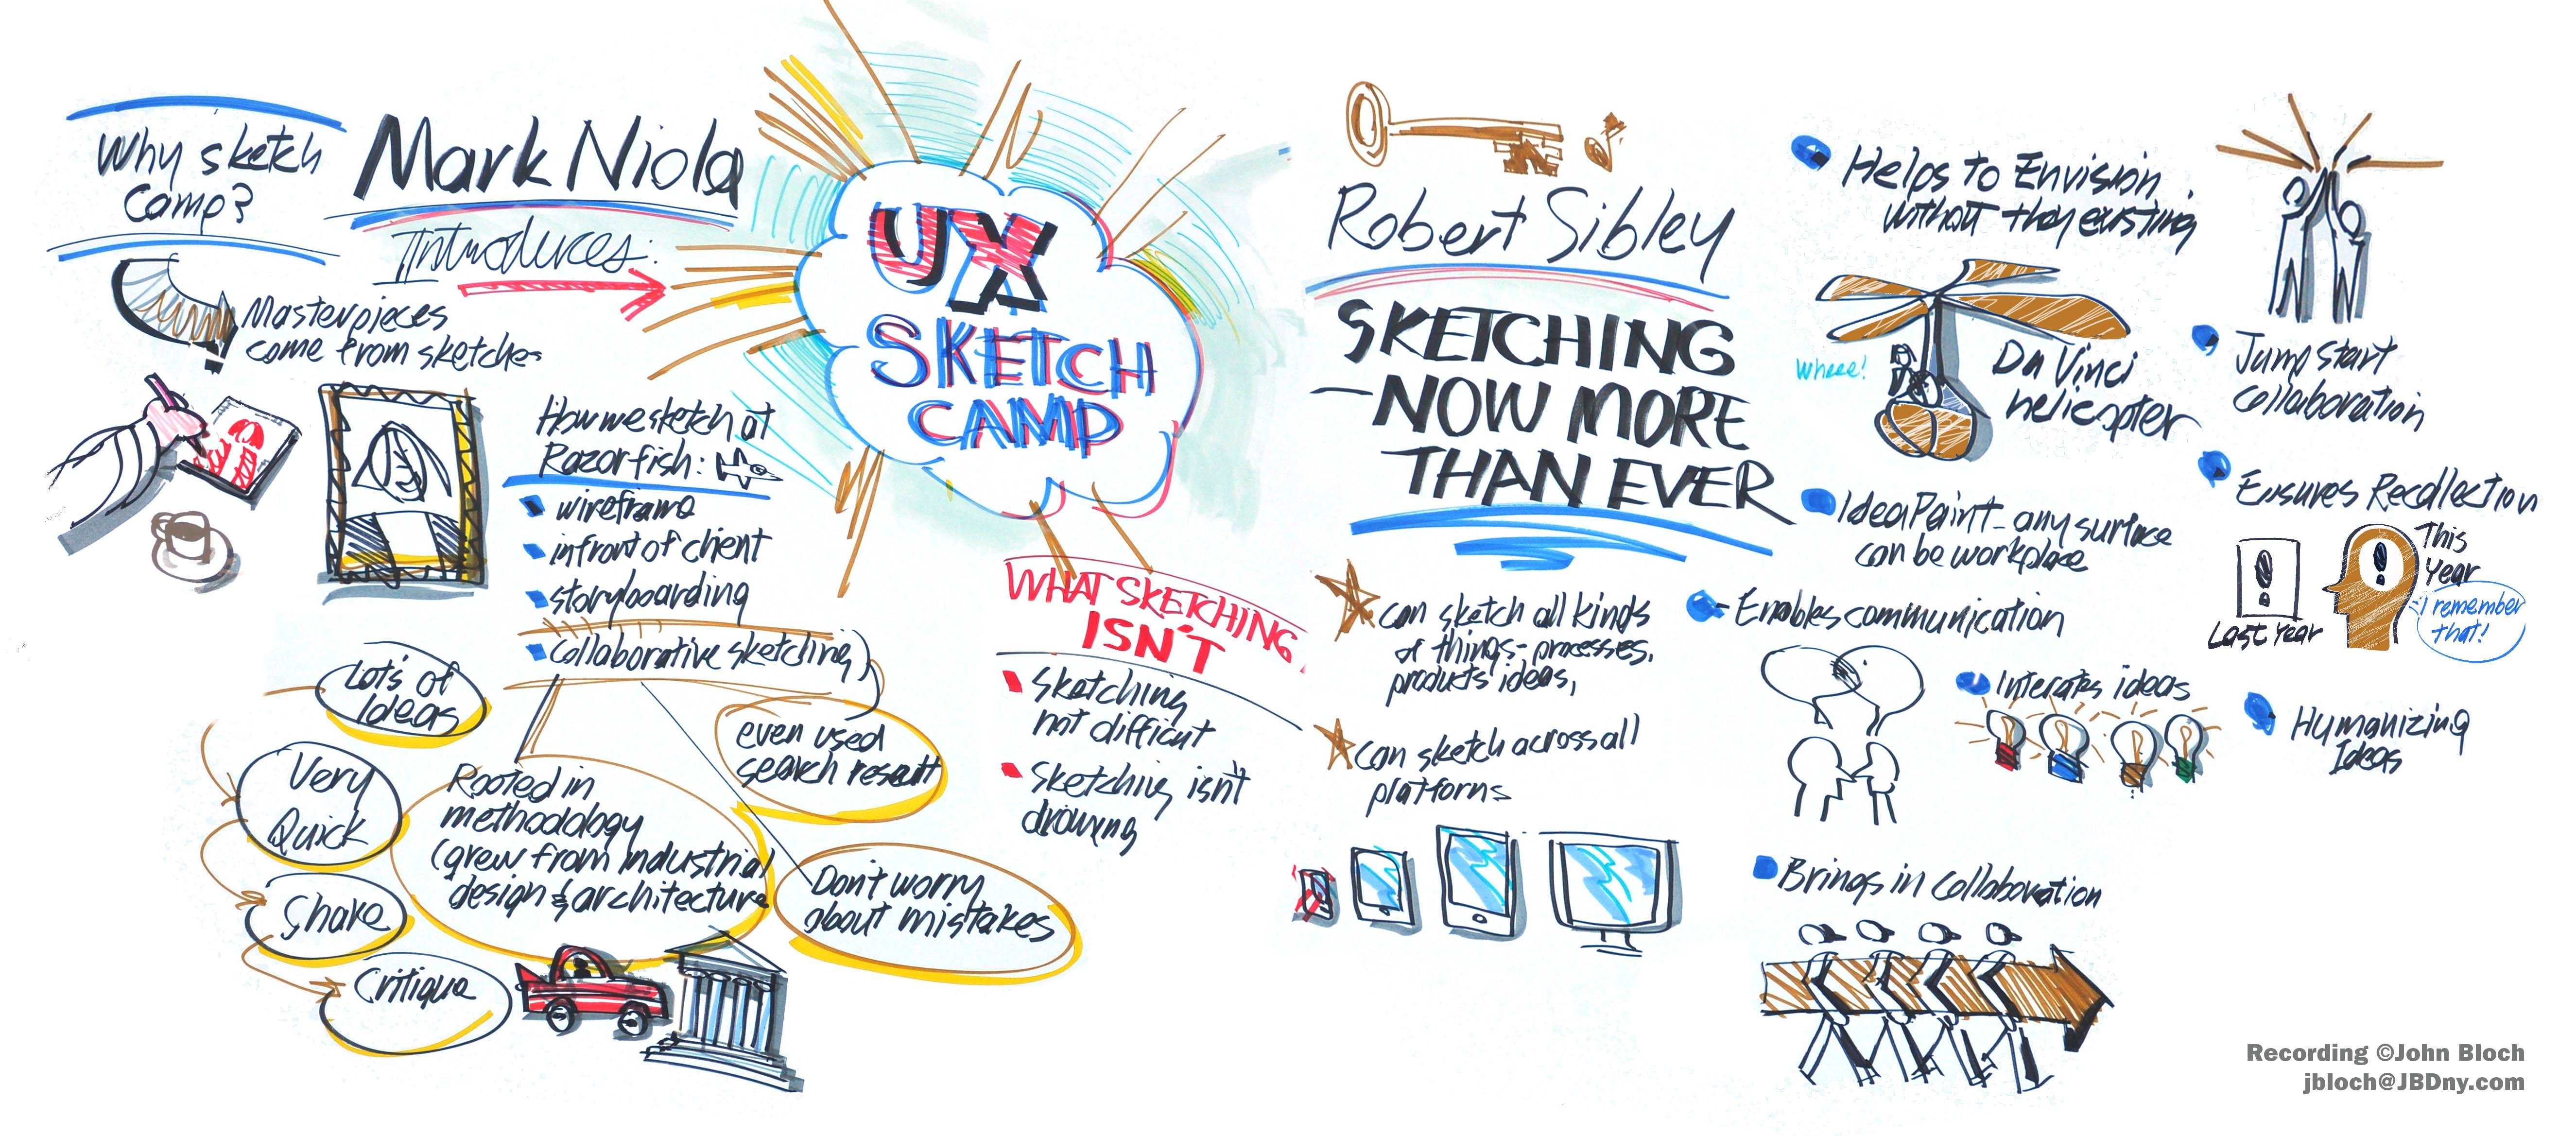 UX Sketchcamp - keynote - Niola